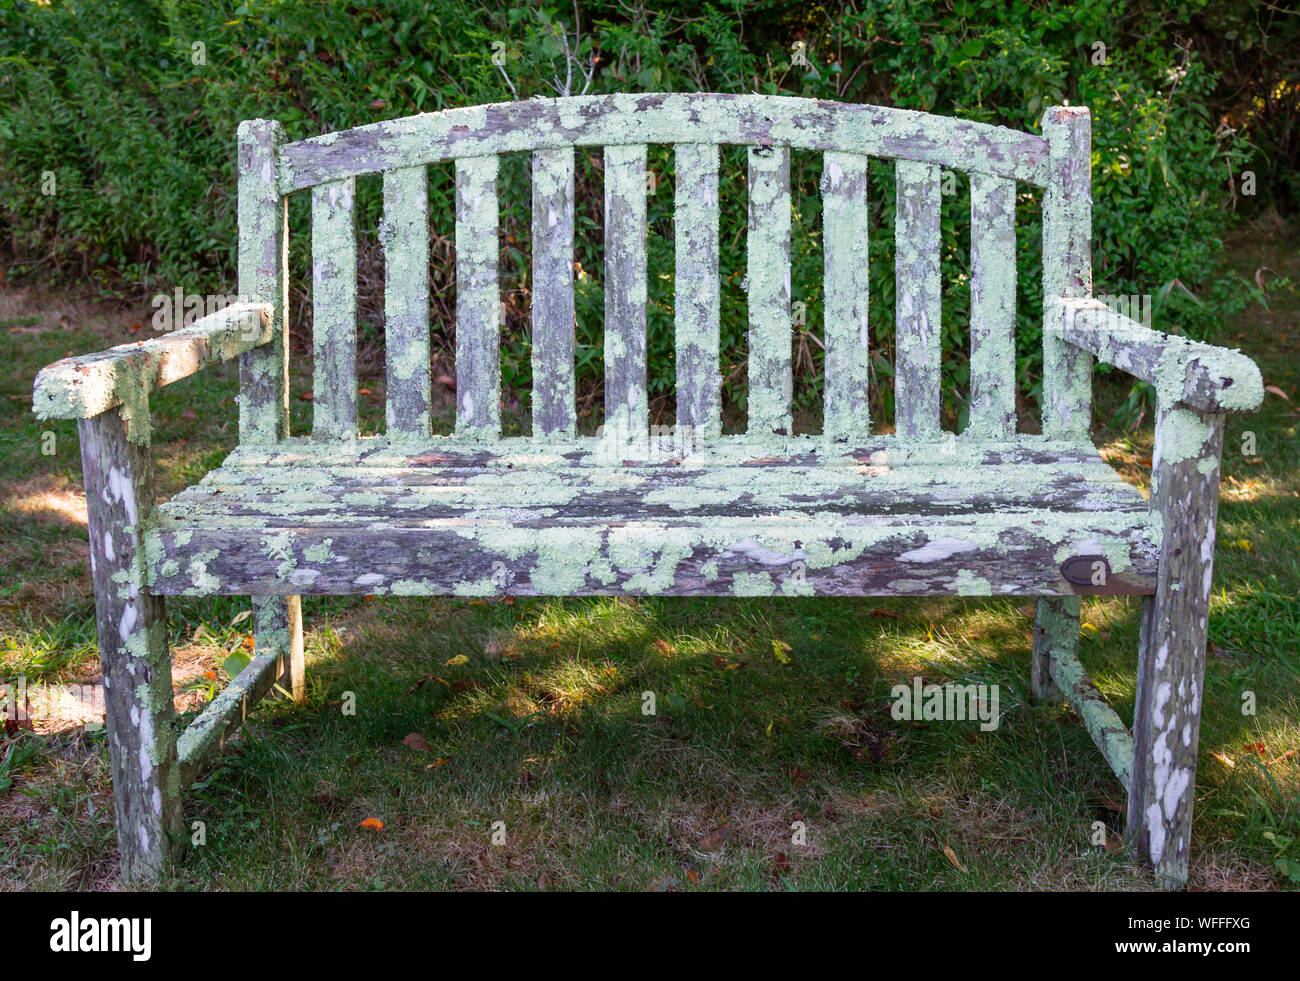 Weathered Teak Furniture Stock Photos & Weathered Teak ...